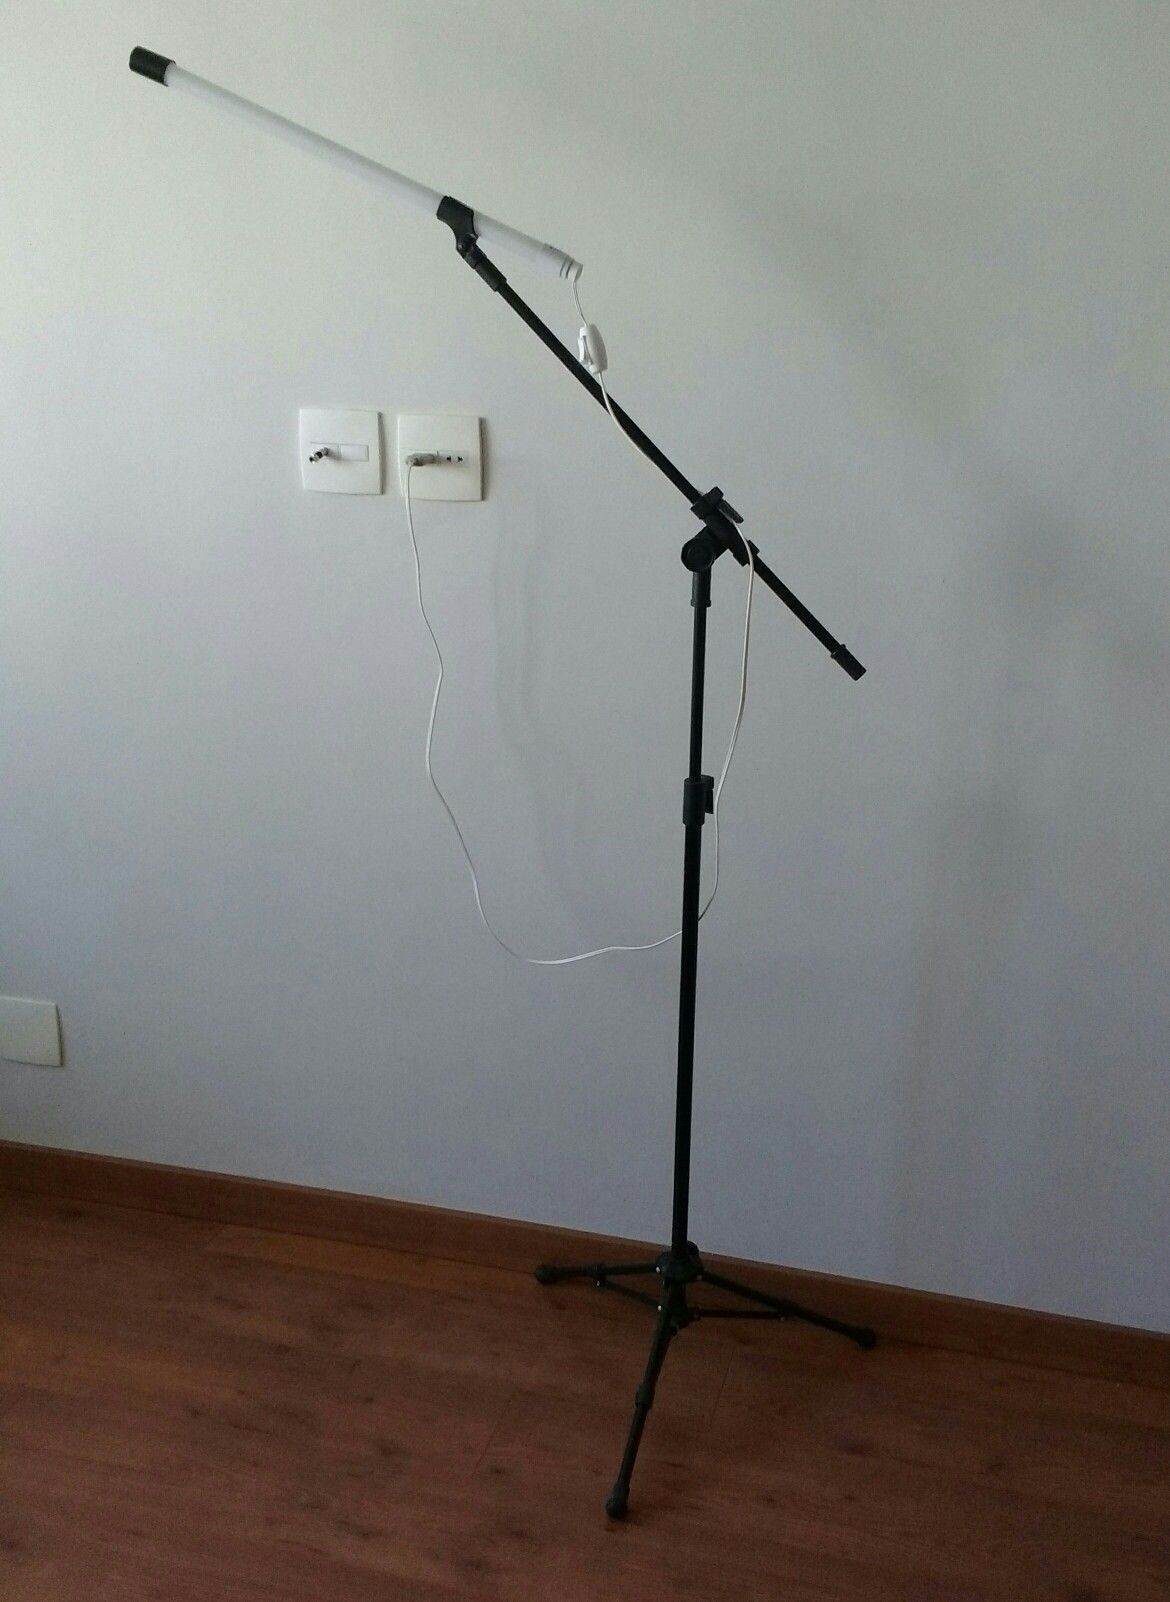 Led Pedestal De Microfone Adatjour Moderno